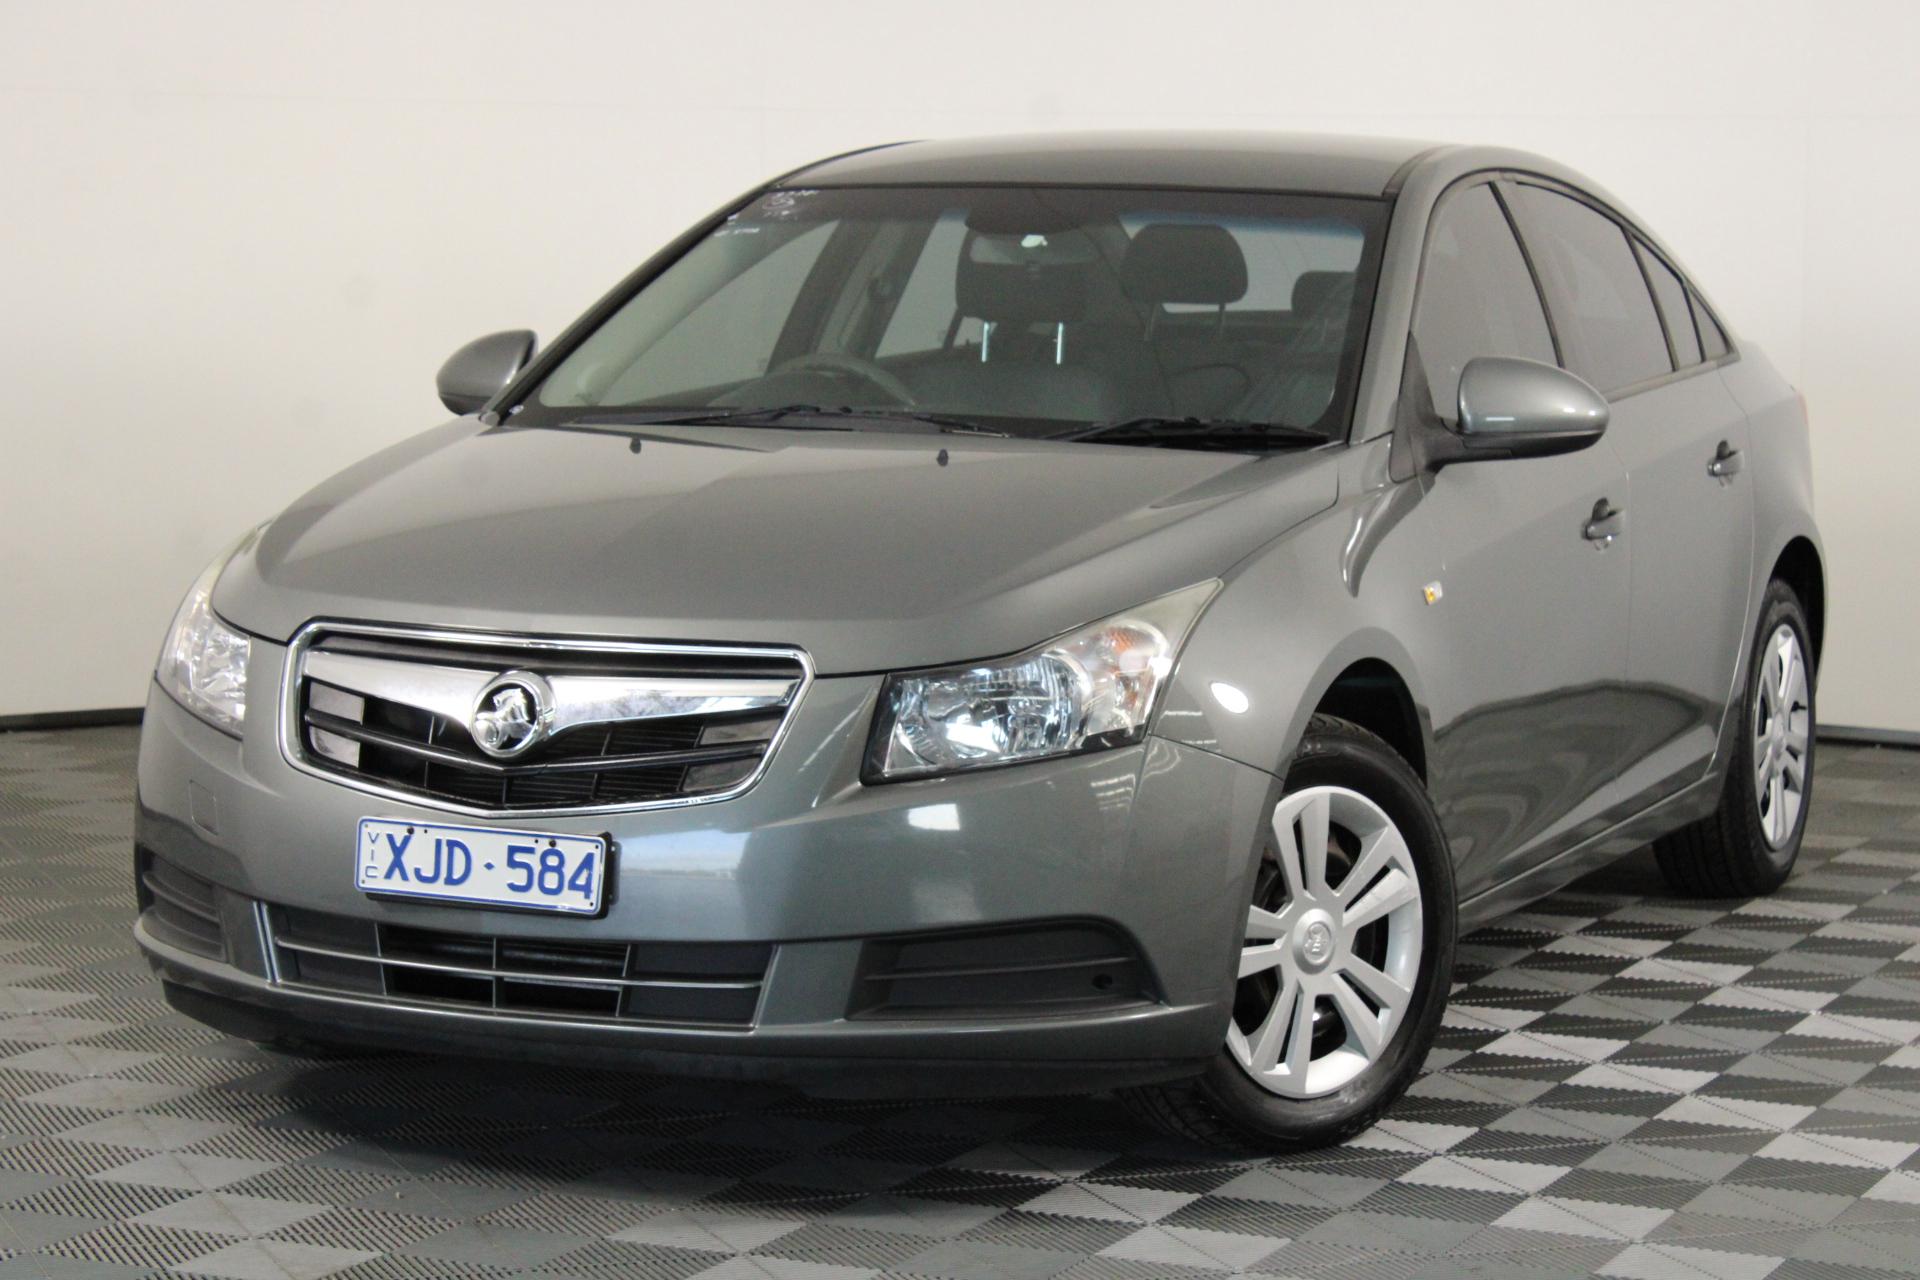 2009 Holden Cruze CD JG Automatic Sedan